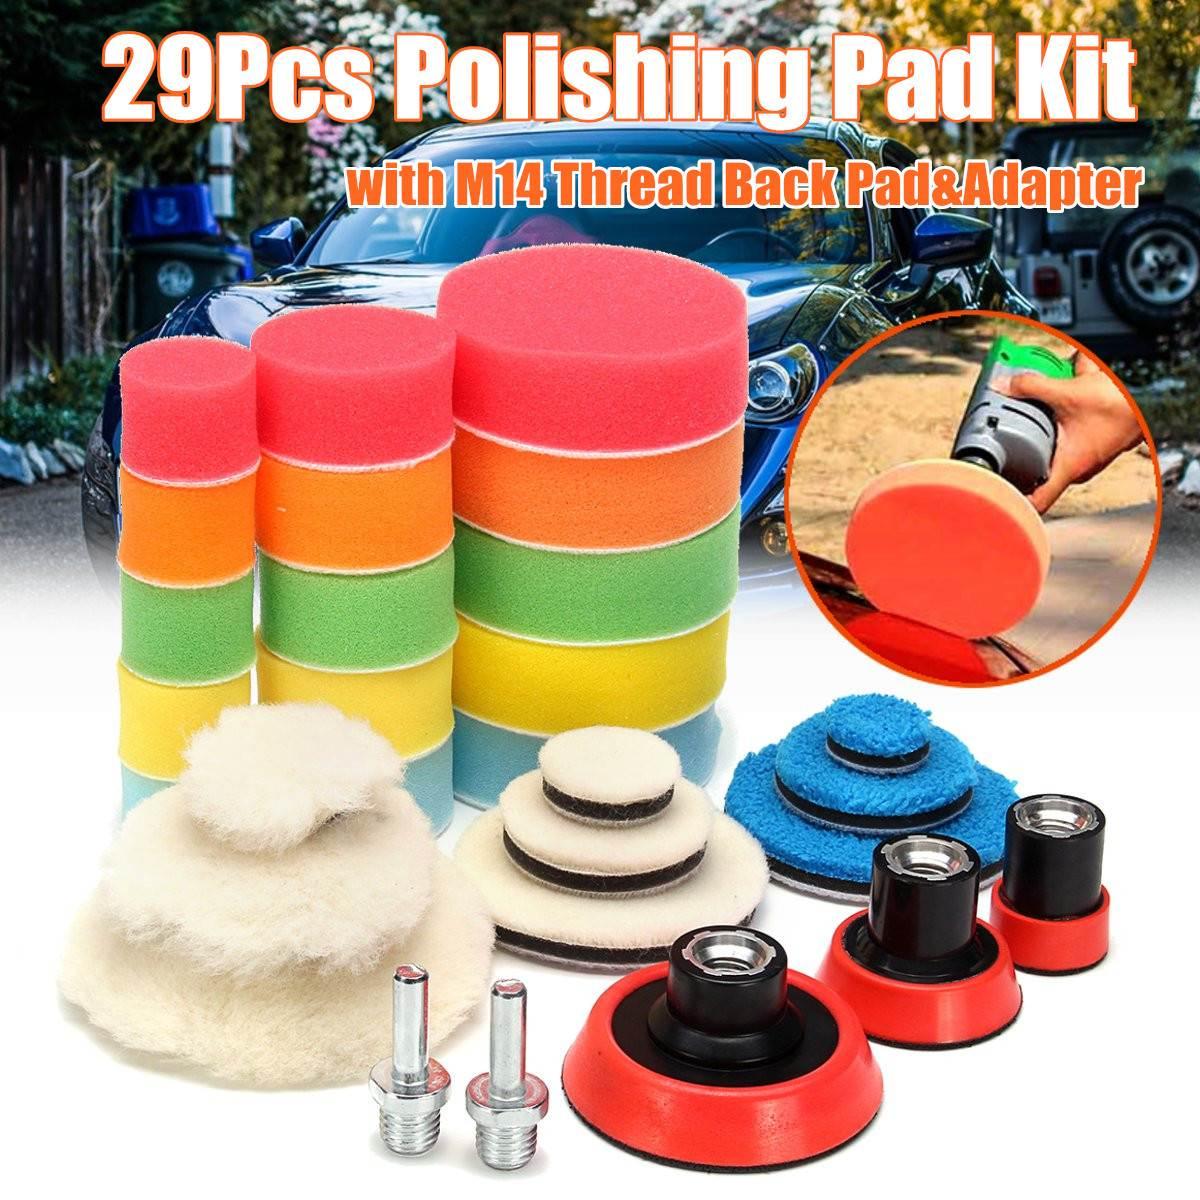 29Pcs Polishing Pad Kit With M14 Thread Back Pad&Adapter Sponge Wool For Polishing Waxing29Pcs Polishing Pad Kit With M14 Thread Back Pad&Adapter Sponge Wool For Polishing Waxing